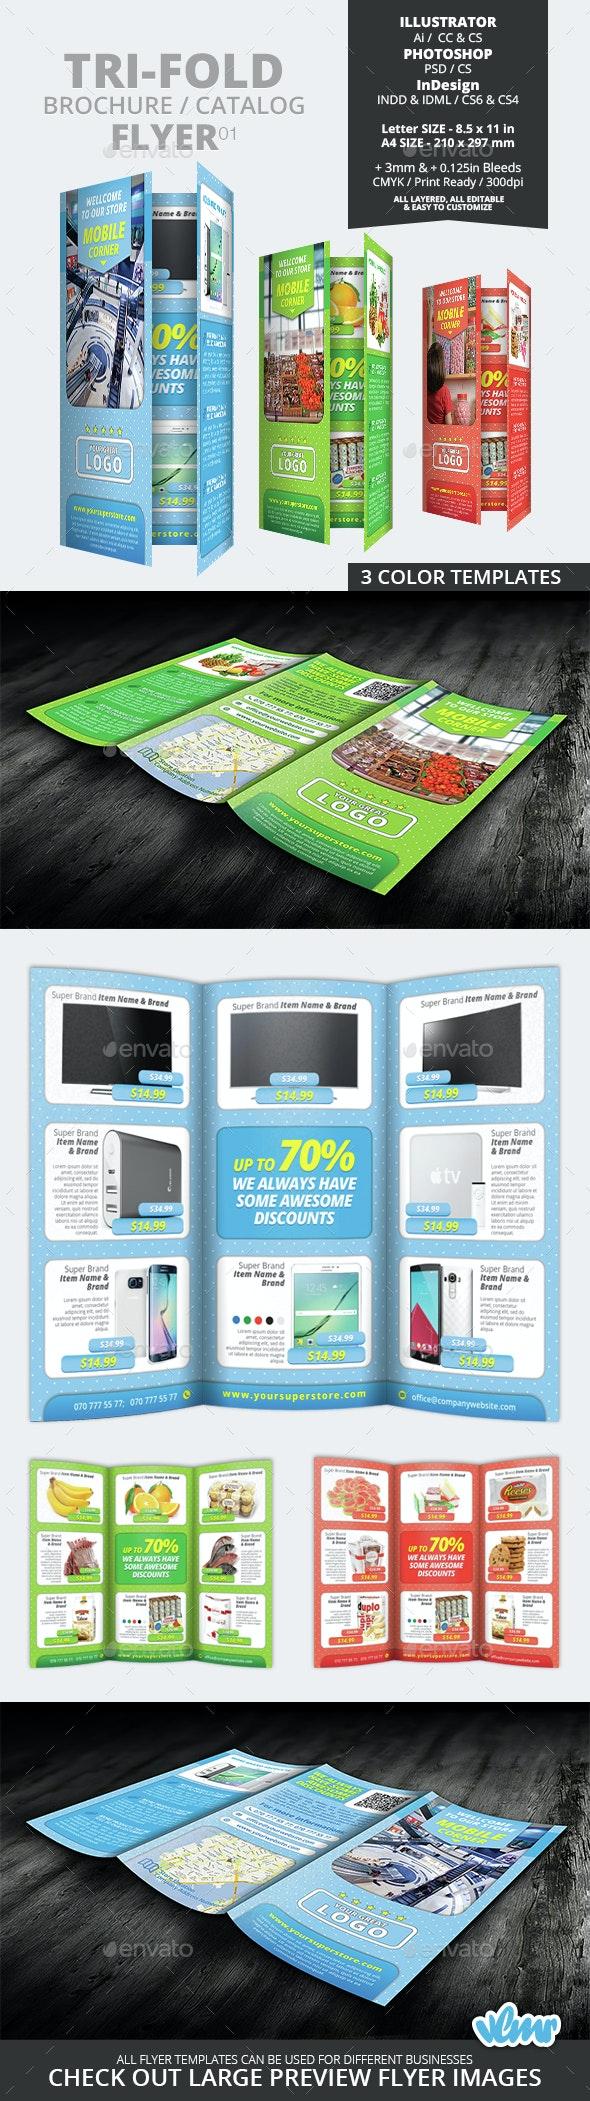 Tri Fold Brochure Catalog Flyer 01 - Catalogs Brochures